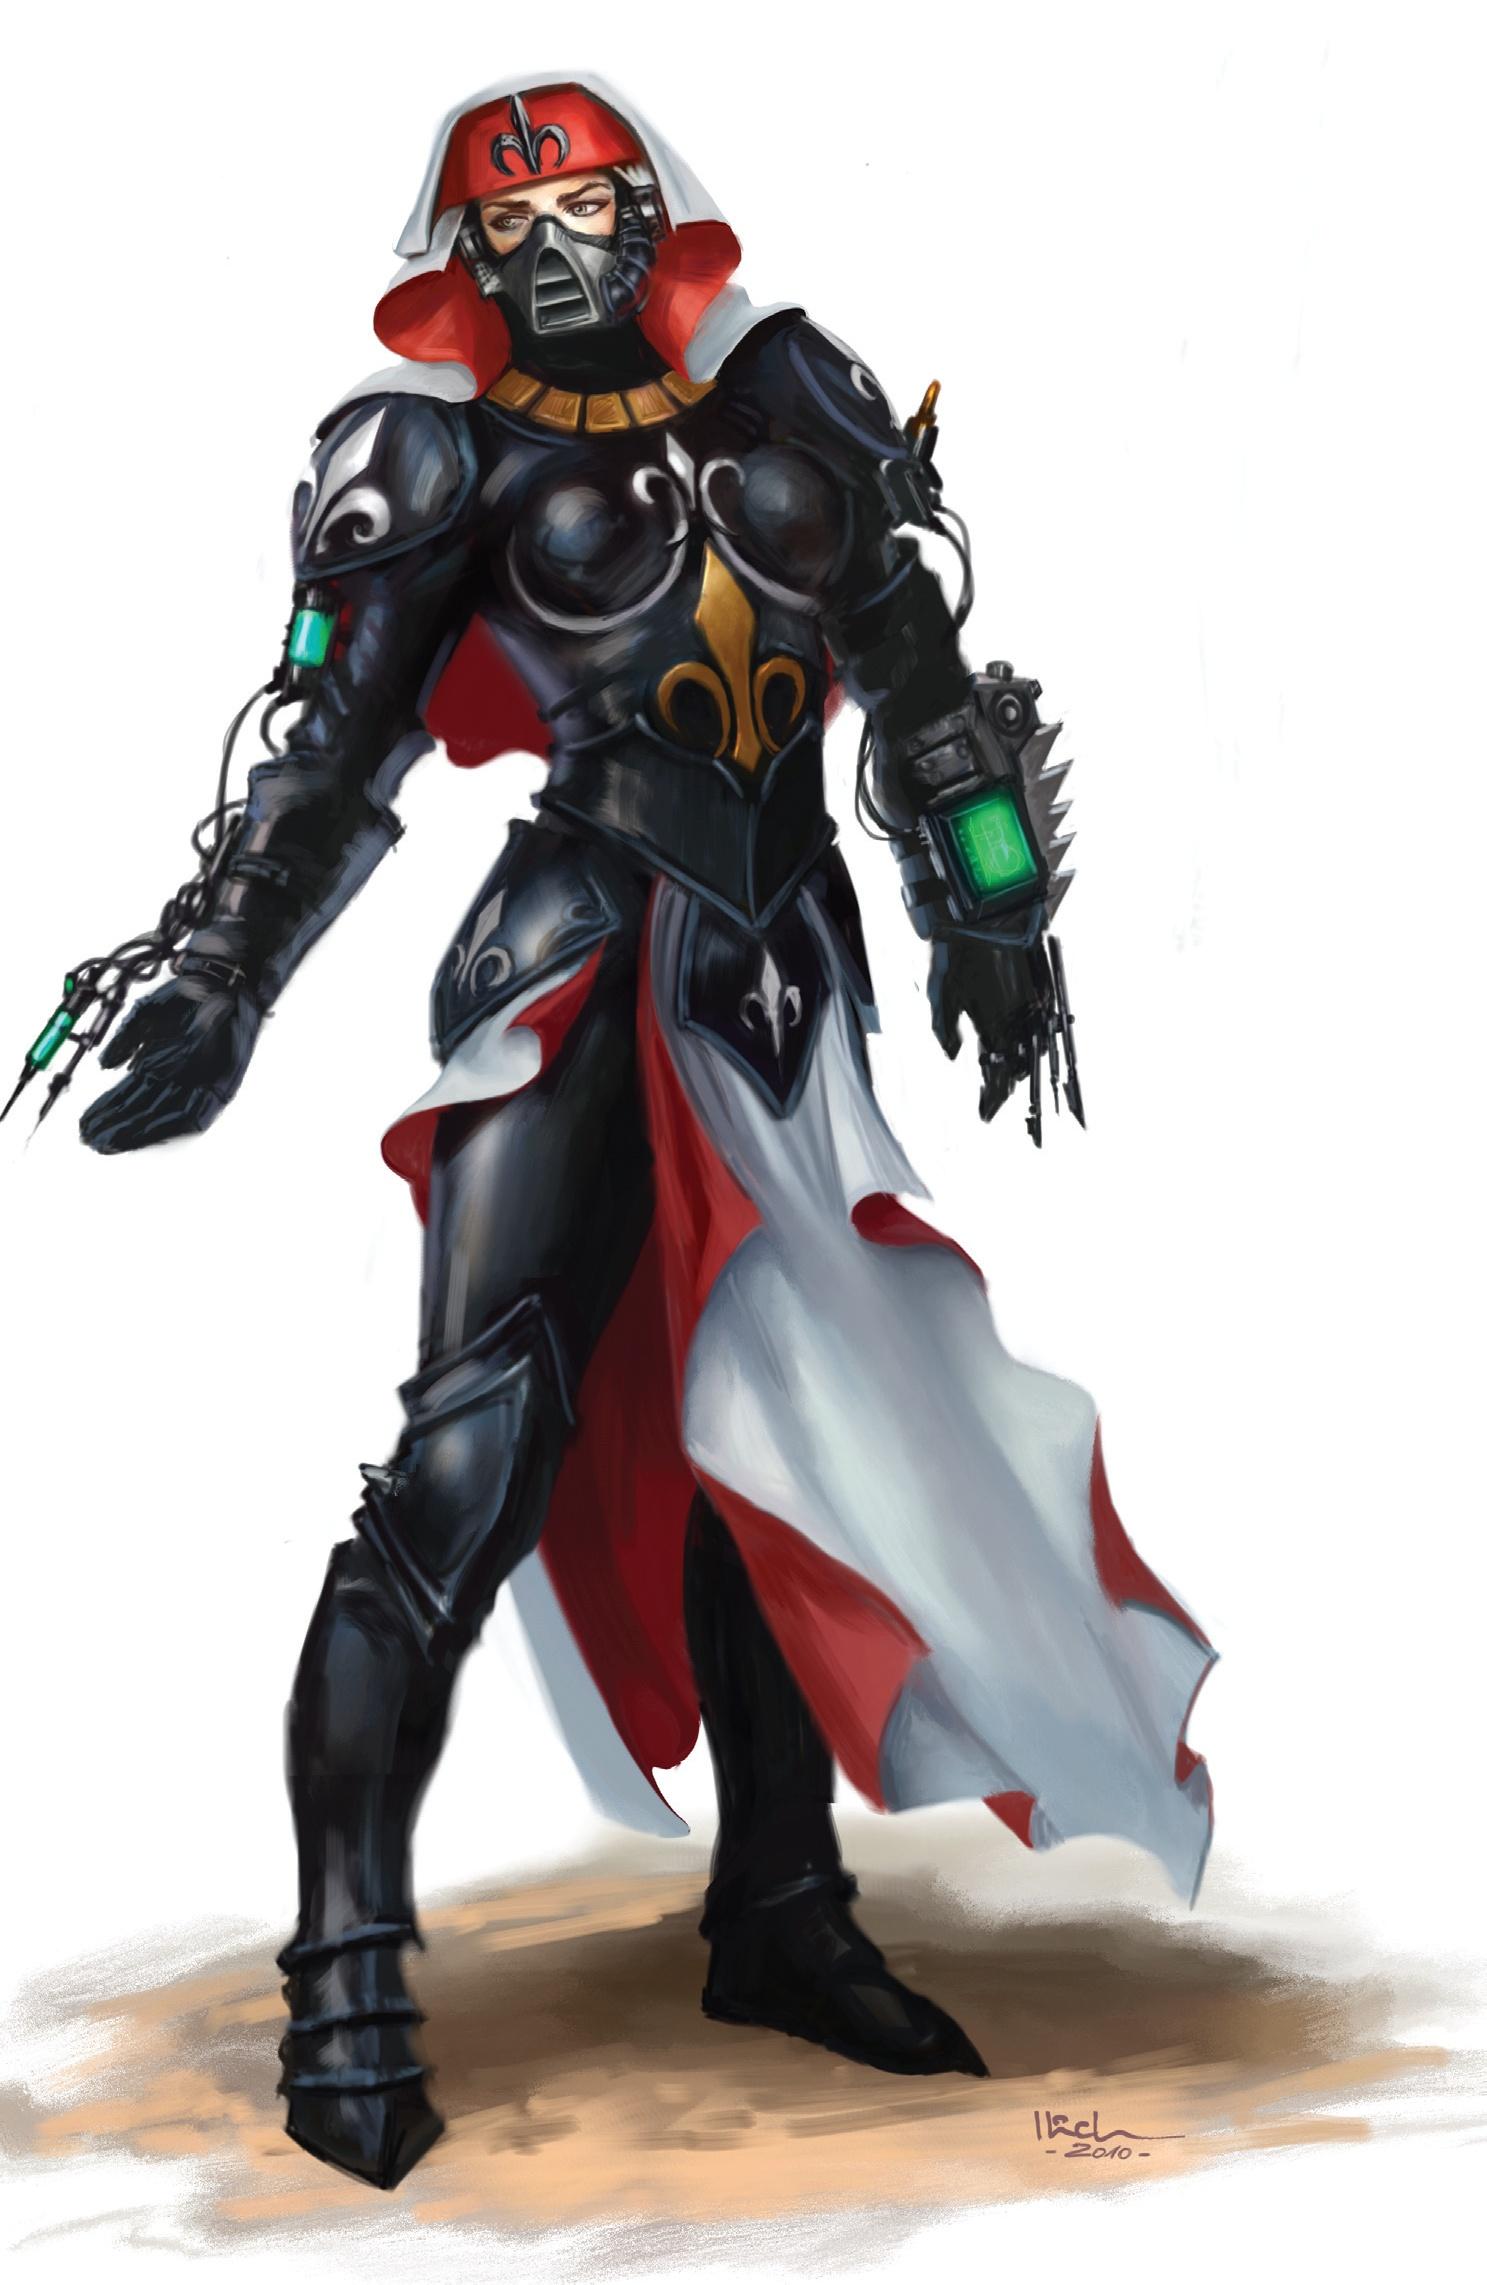 Serenity armor